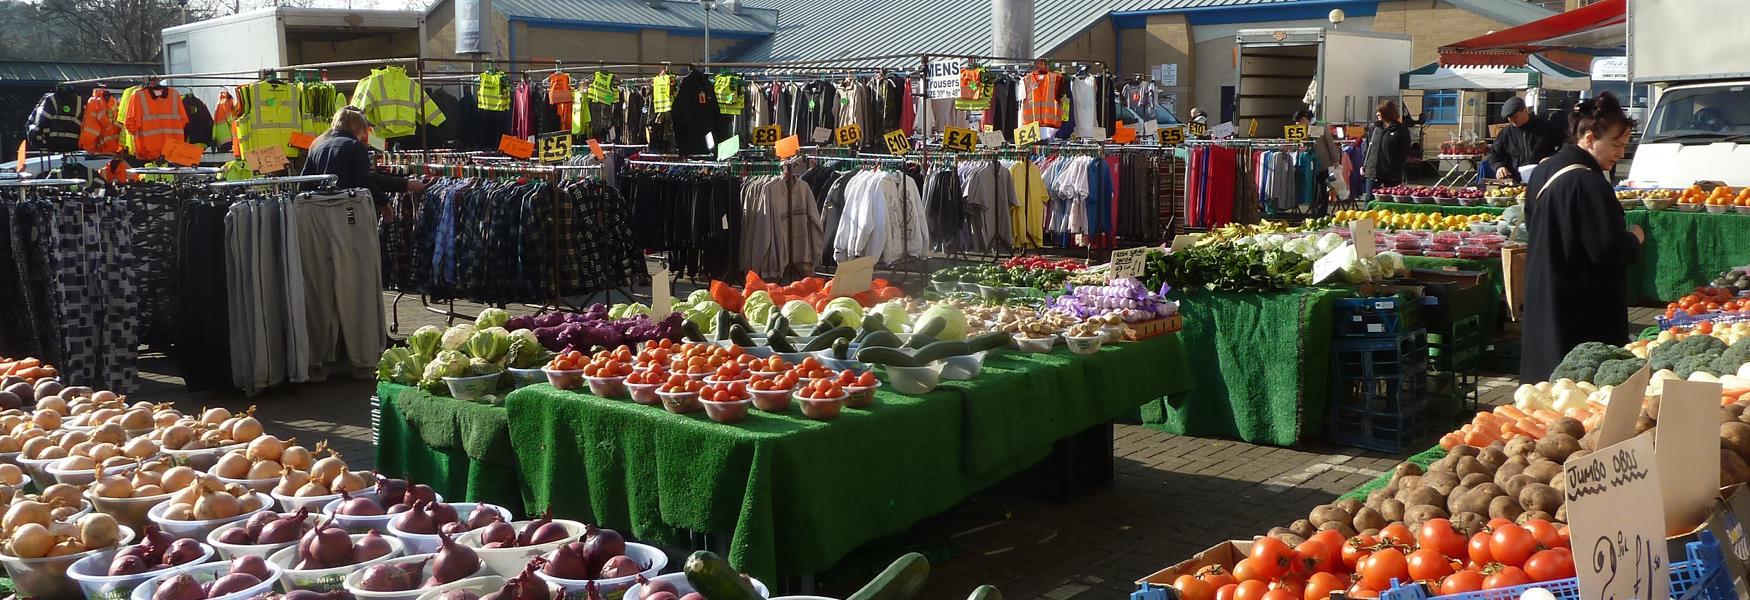 Maidstone Market